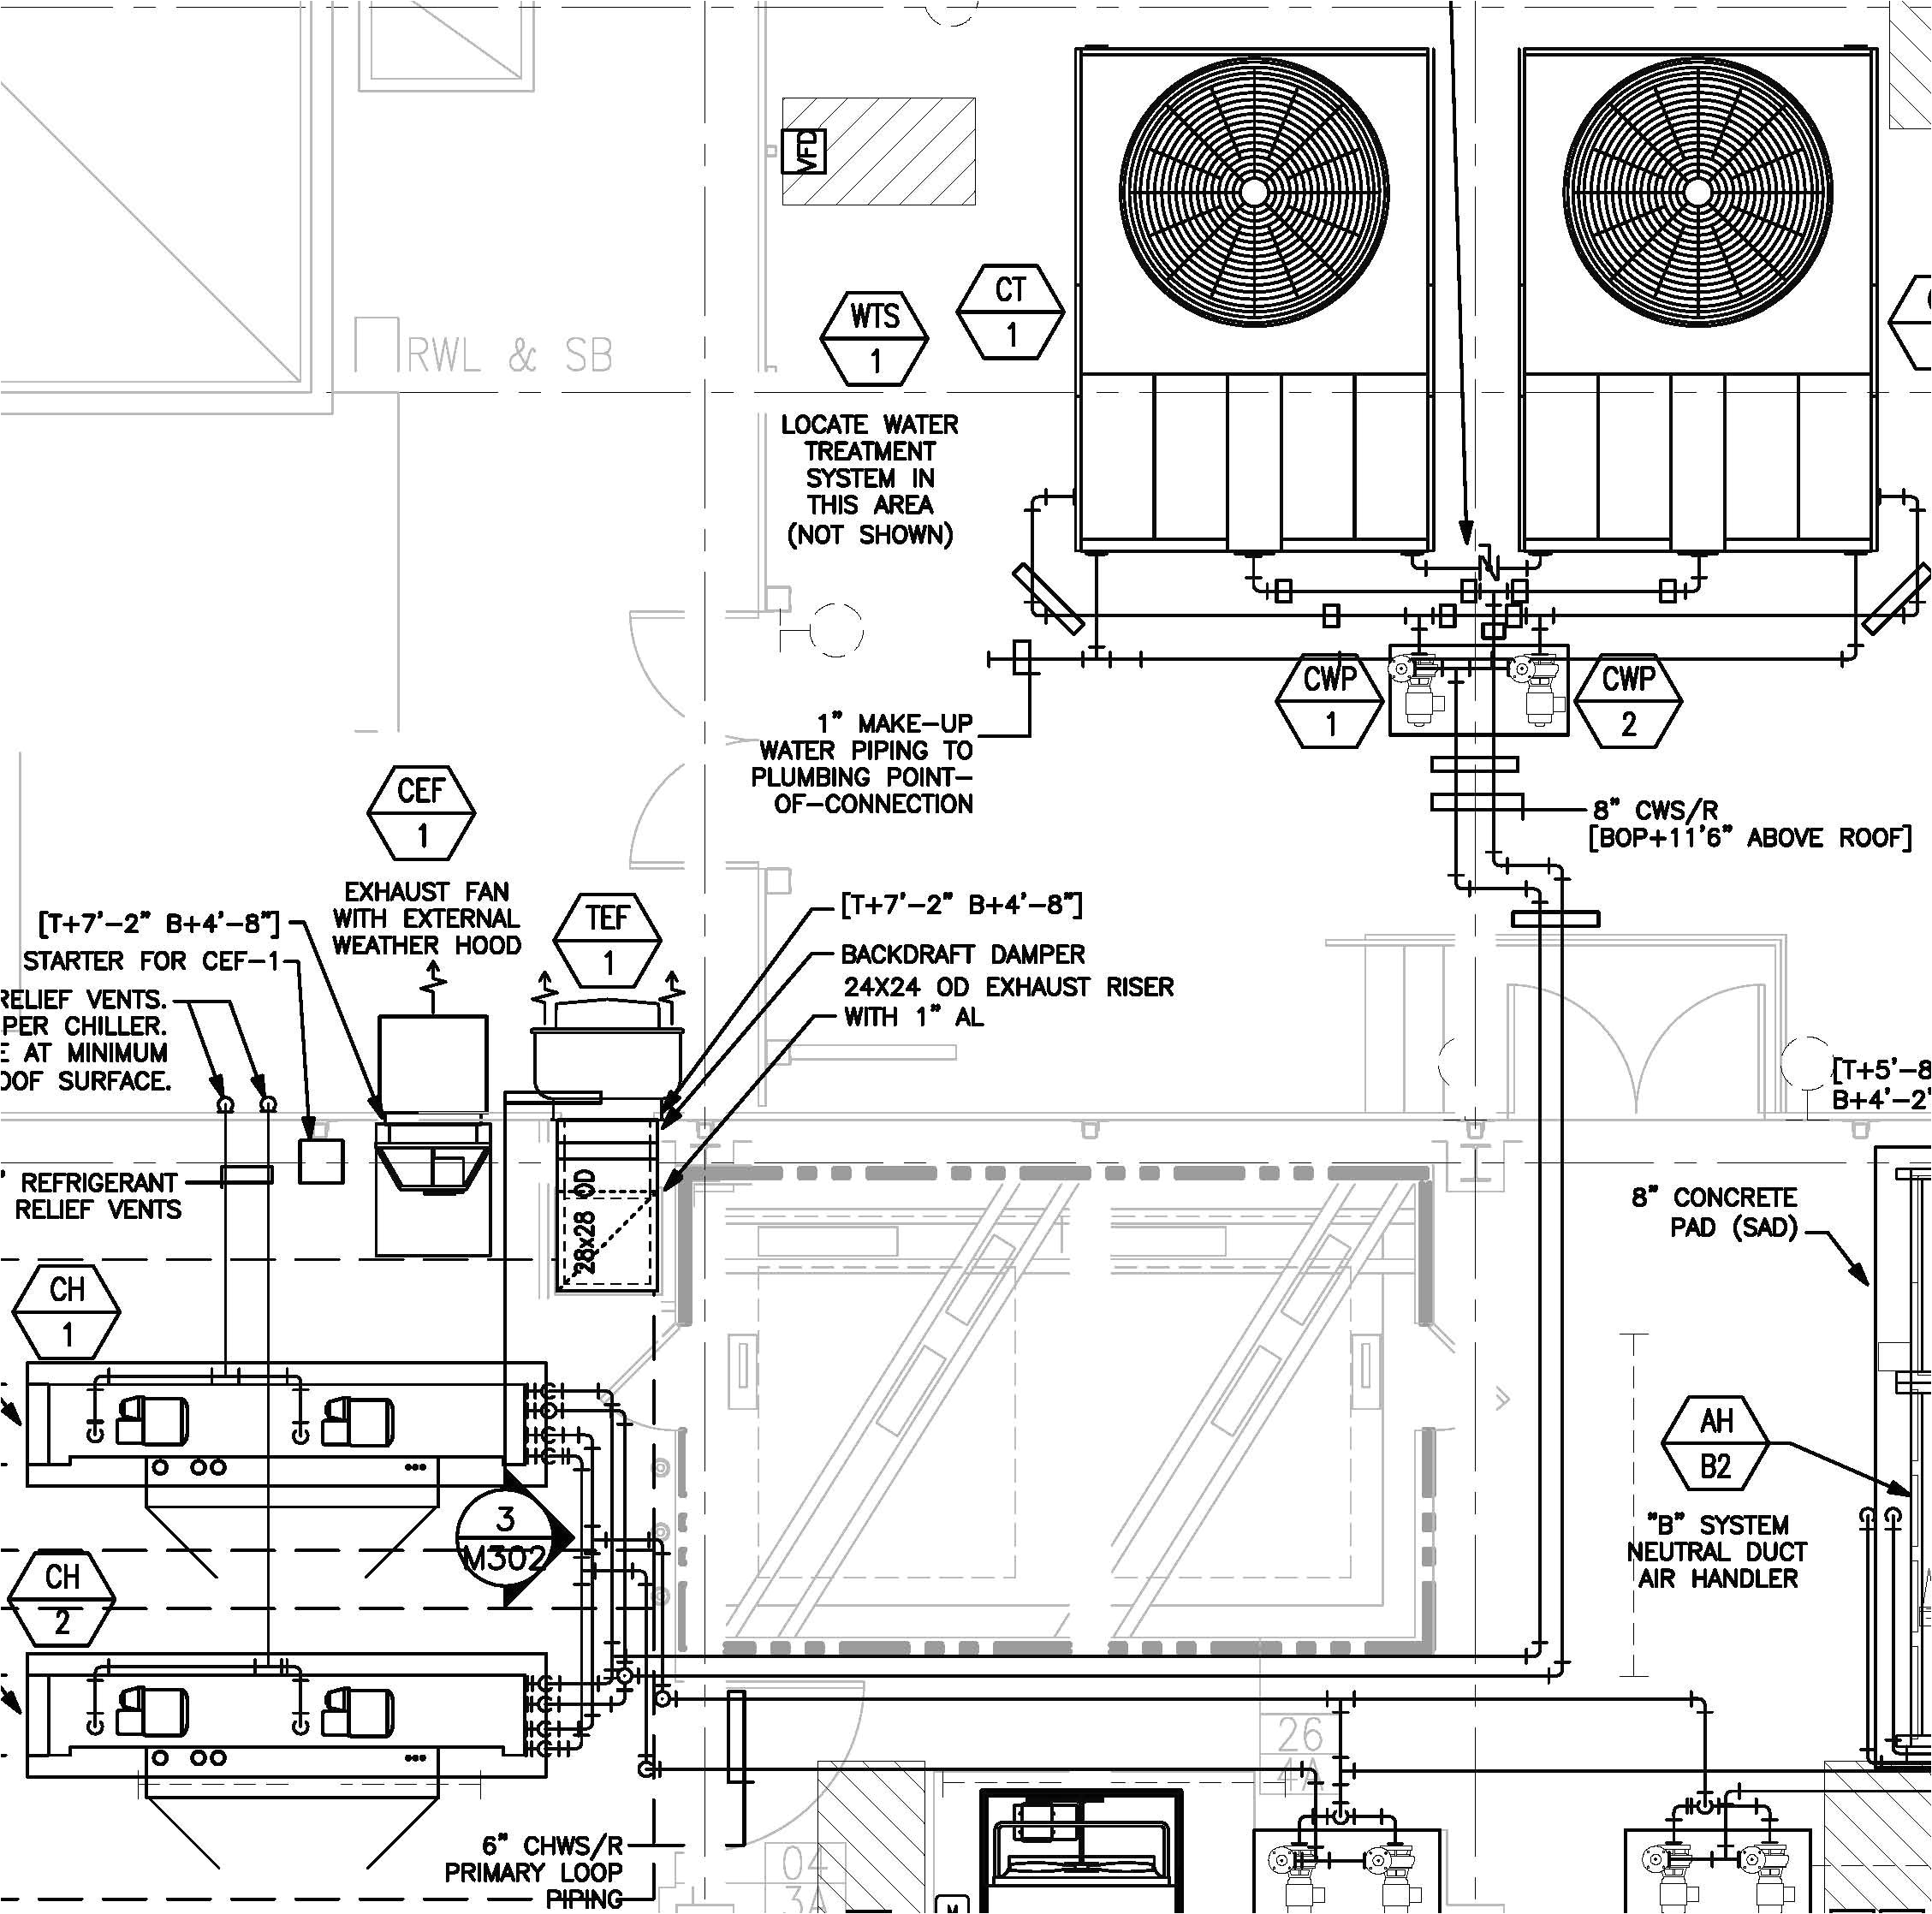 wiring diagram heat pump system new york hvac wiring diagrams wiring diagram